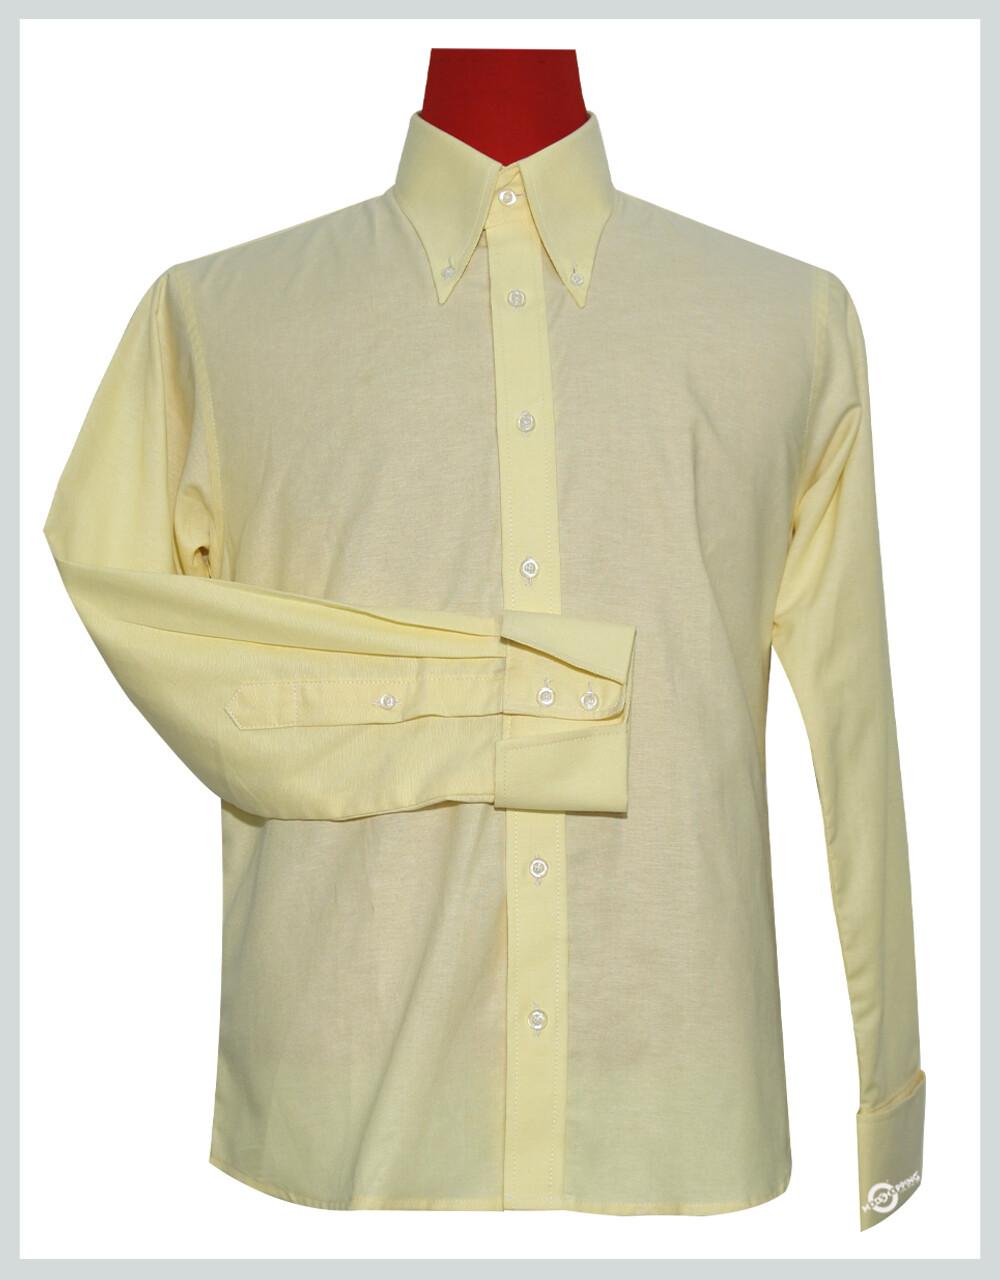 Button Down Oxford Fabric | Cream Color Shirt For Men